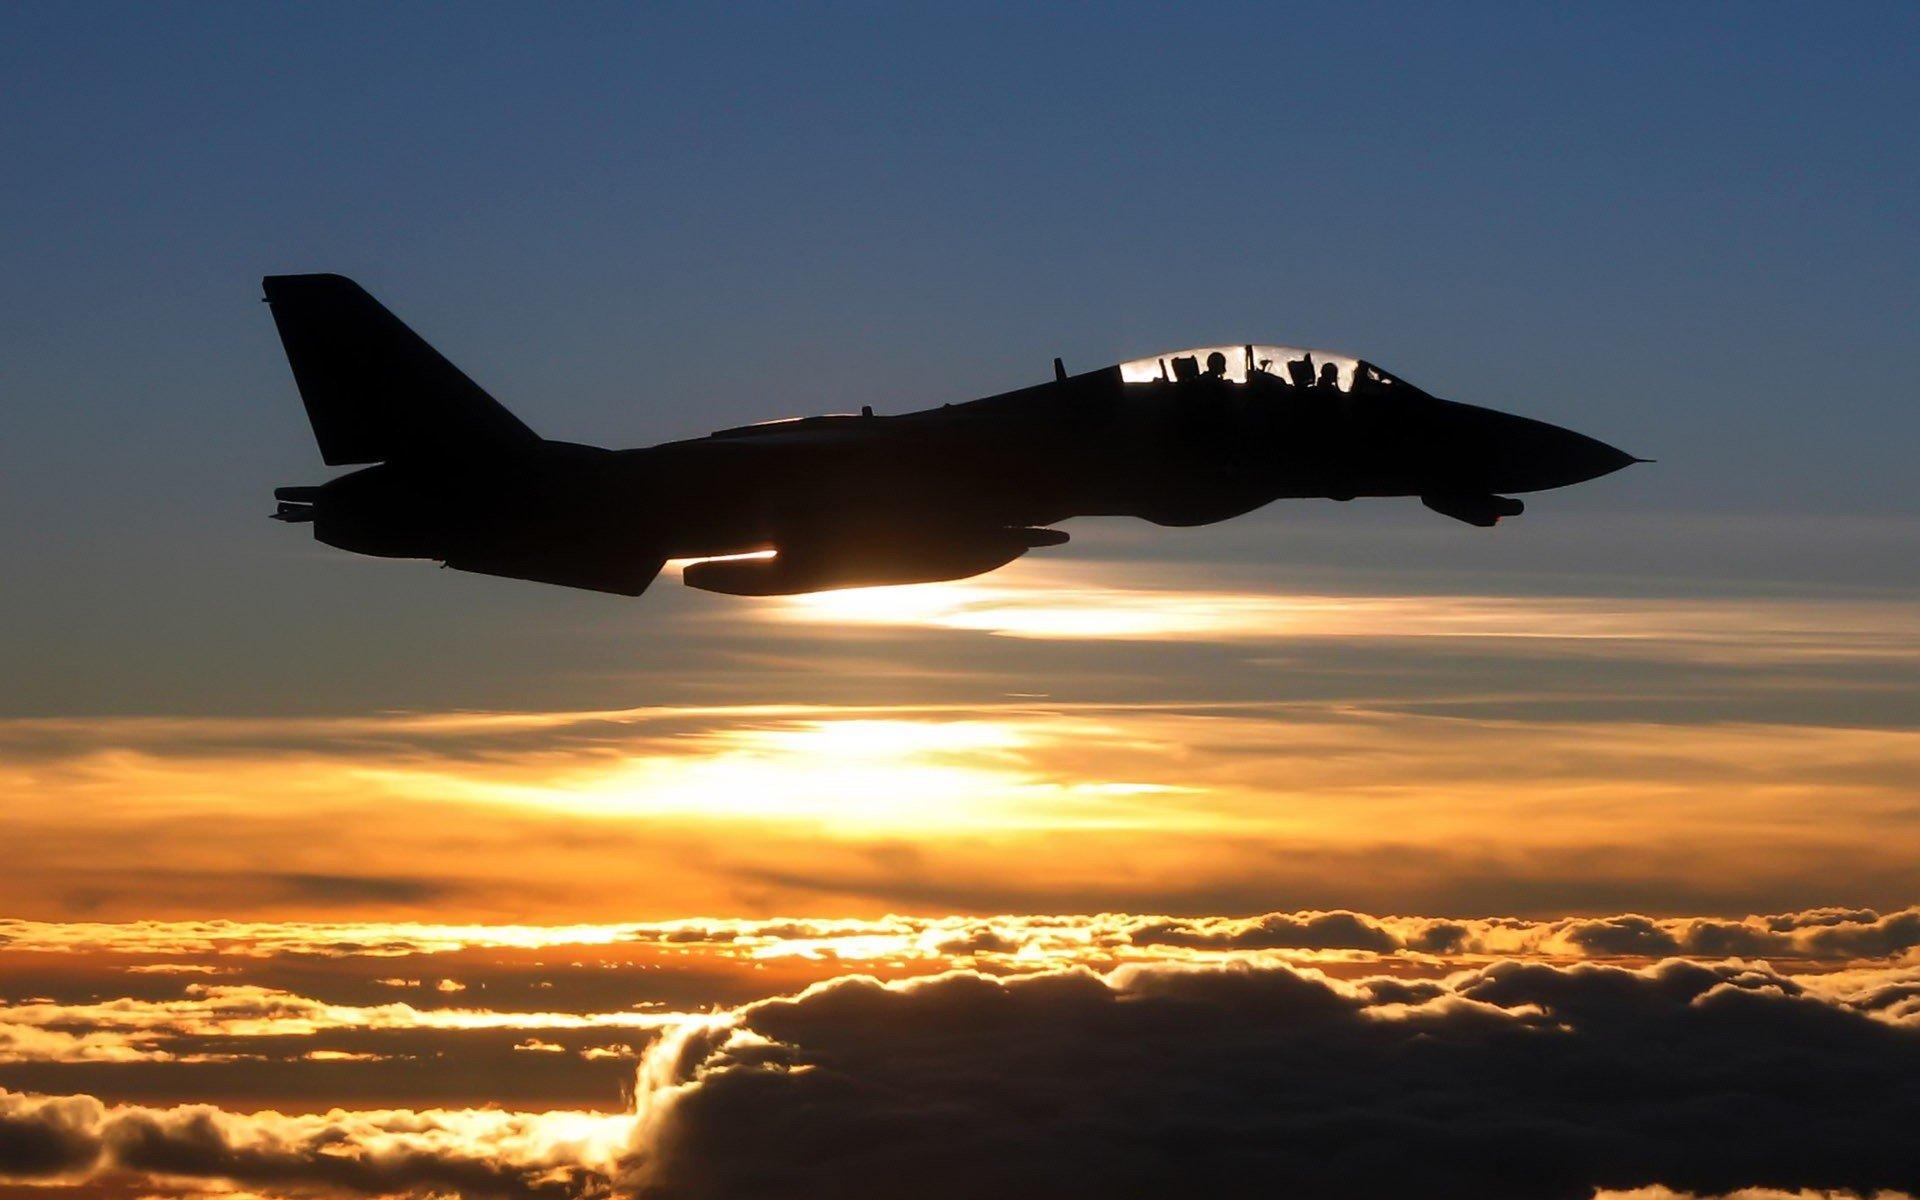 Обои Облака, полет, истребители. Авиация foto 14